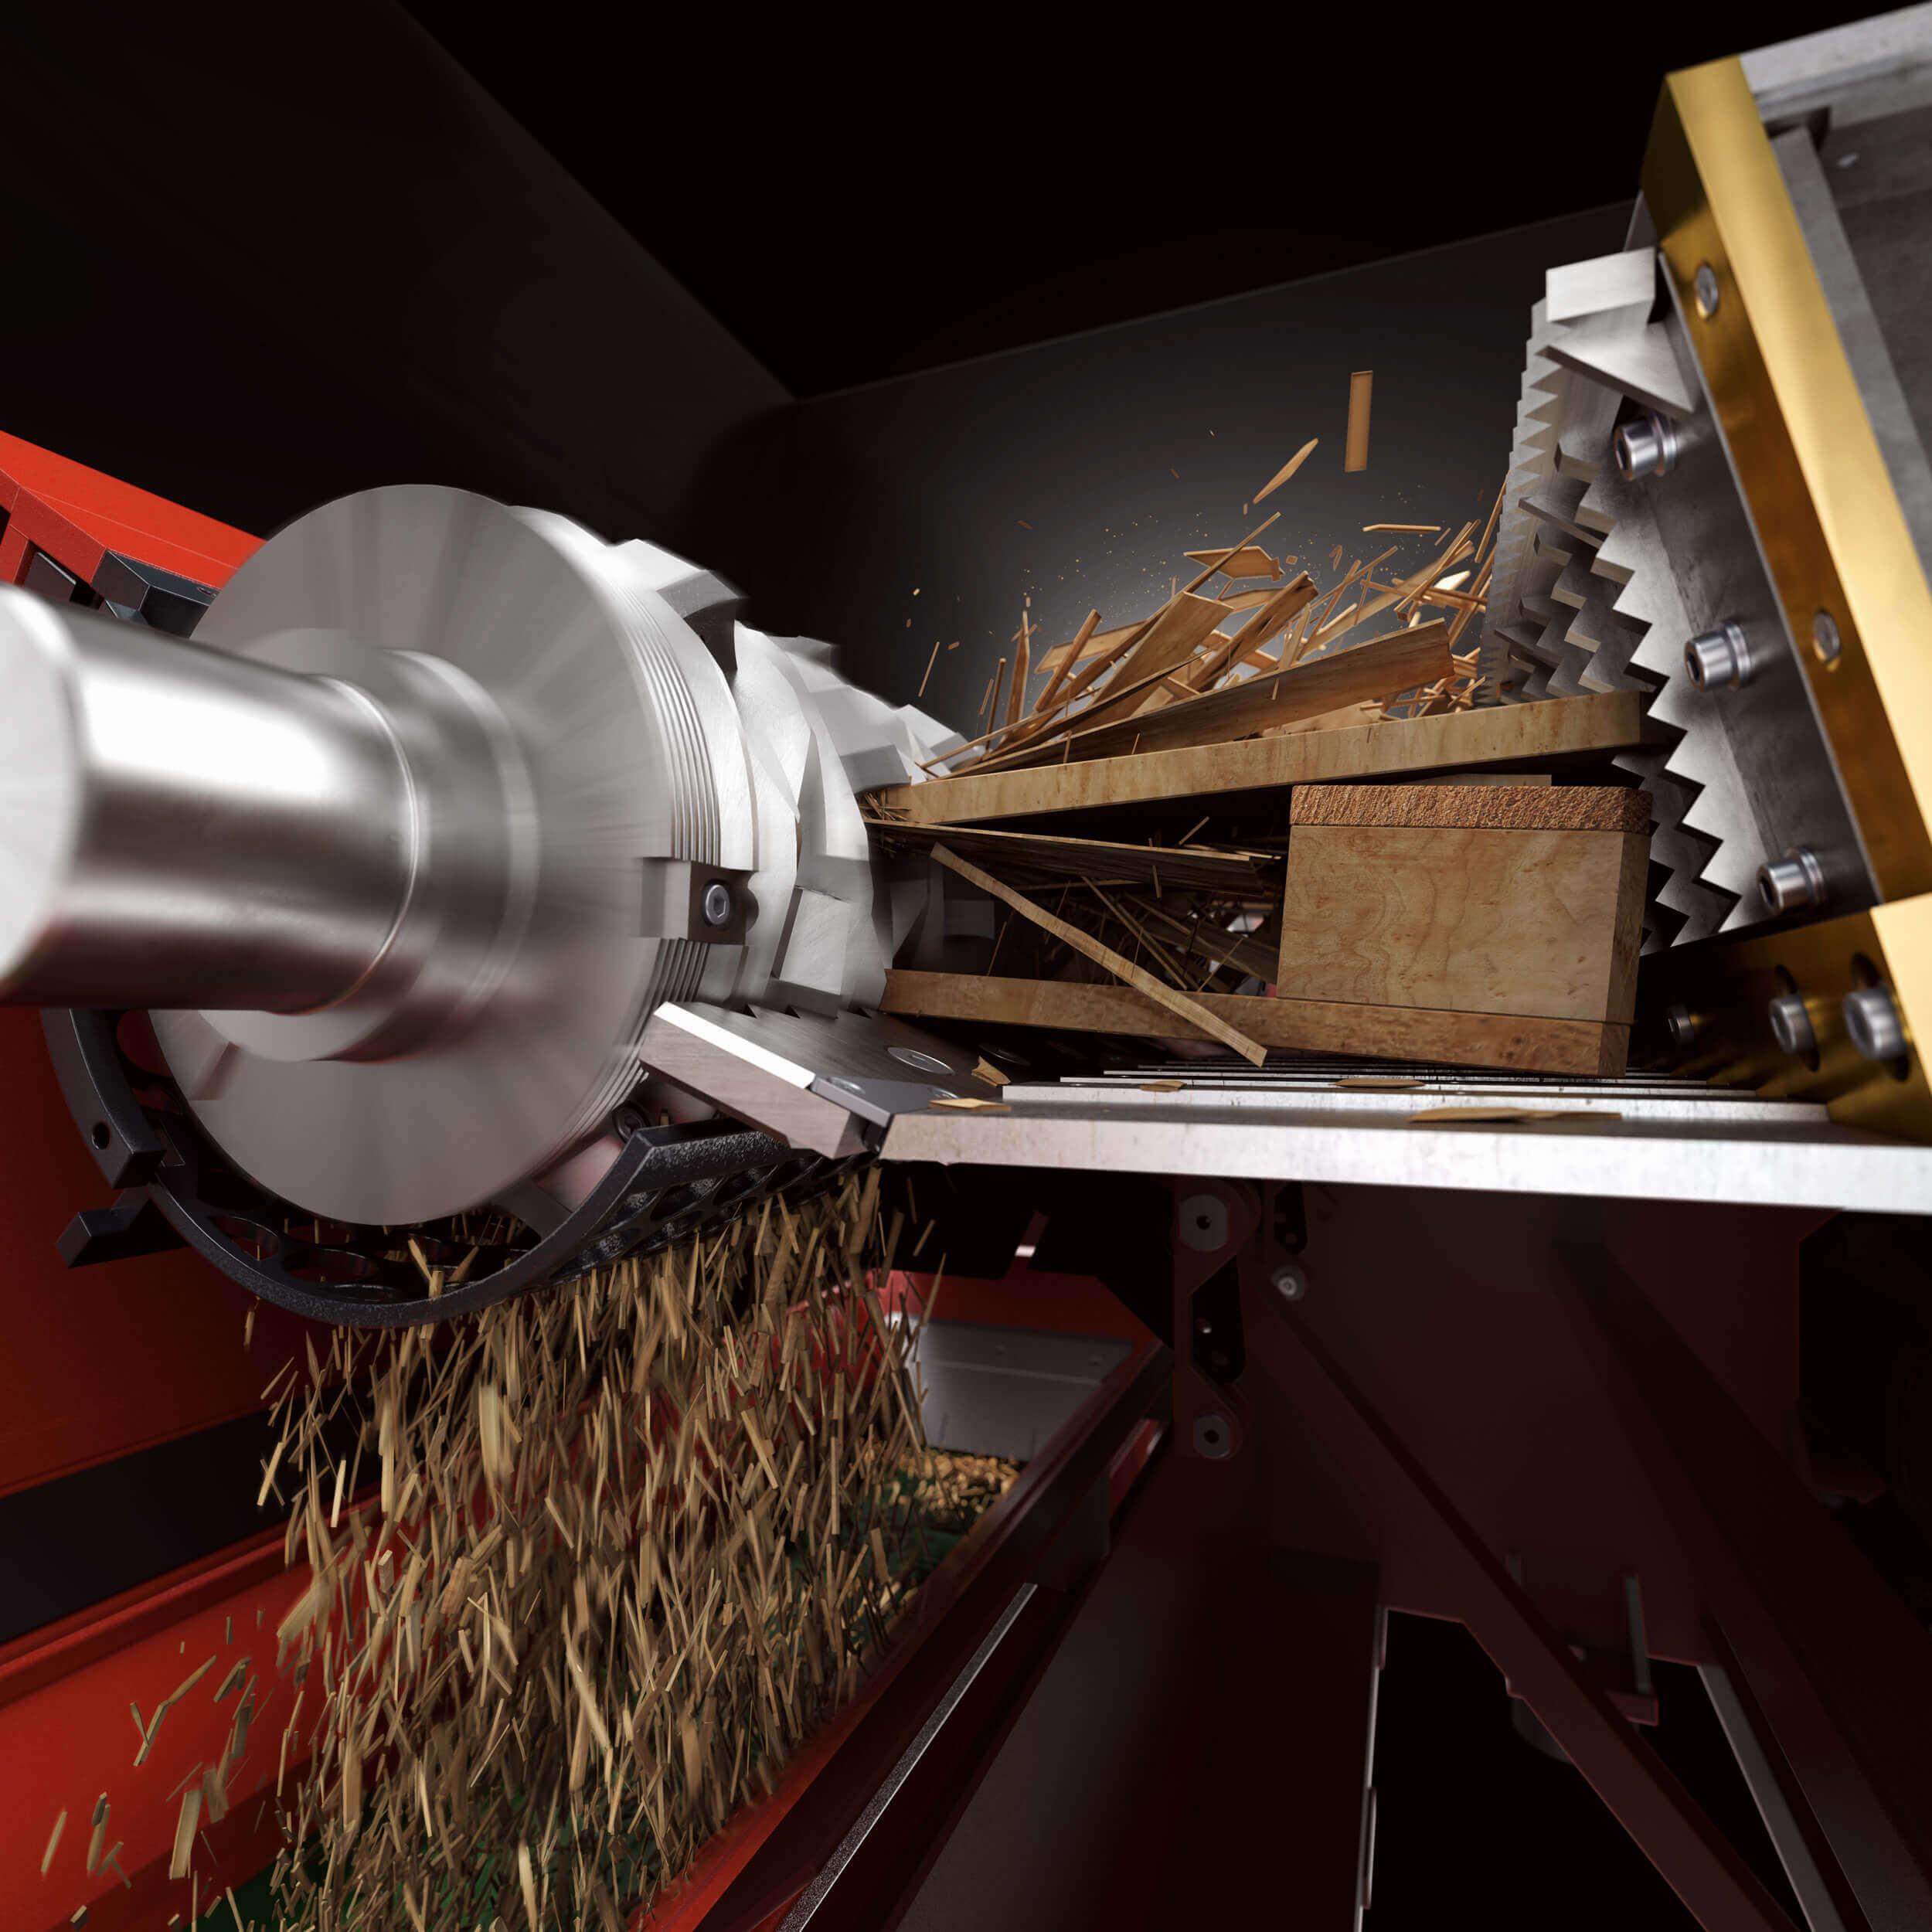 Detailed rendering of shredding process with WEIMA WLK 1500 single-shaft shredder